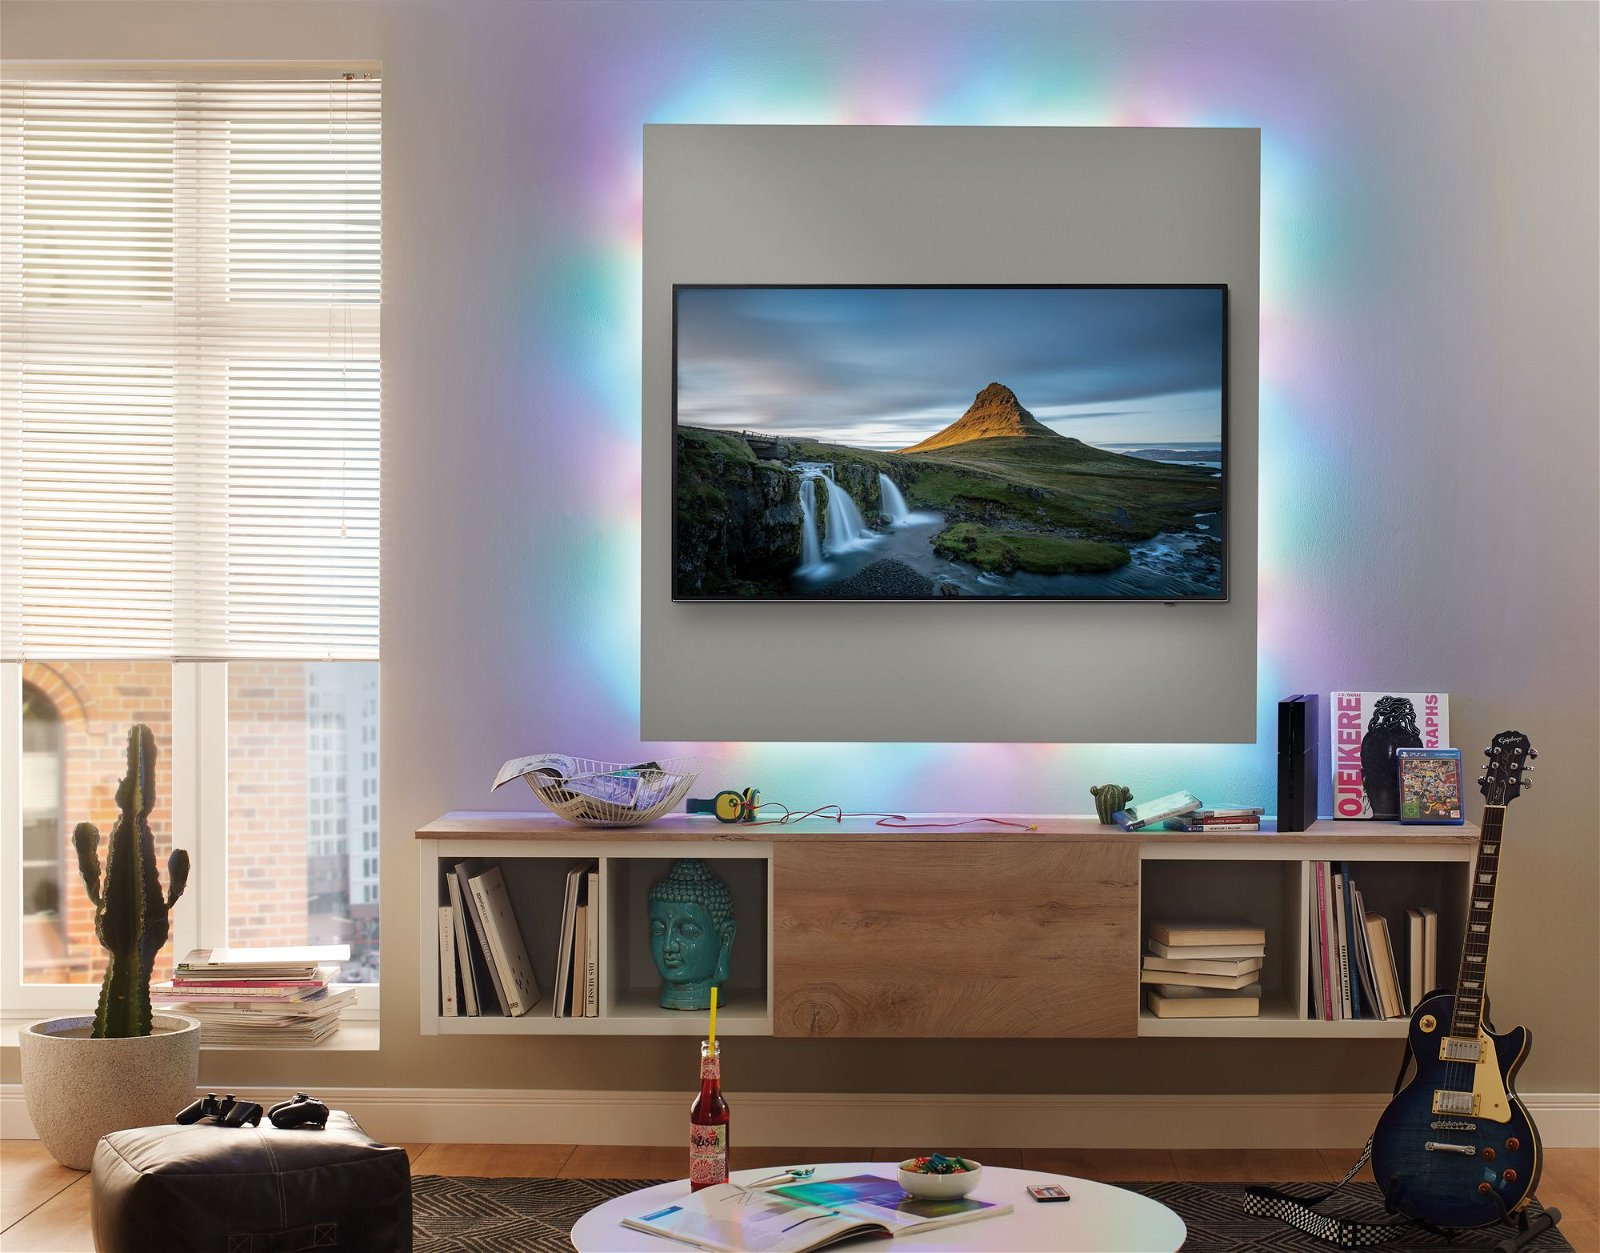 SimpLED Motion LED Strip RGB 7,6m beschichtet 15W 494lm RGB 18VA